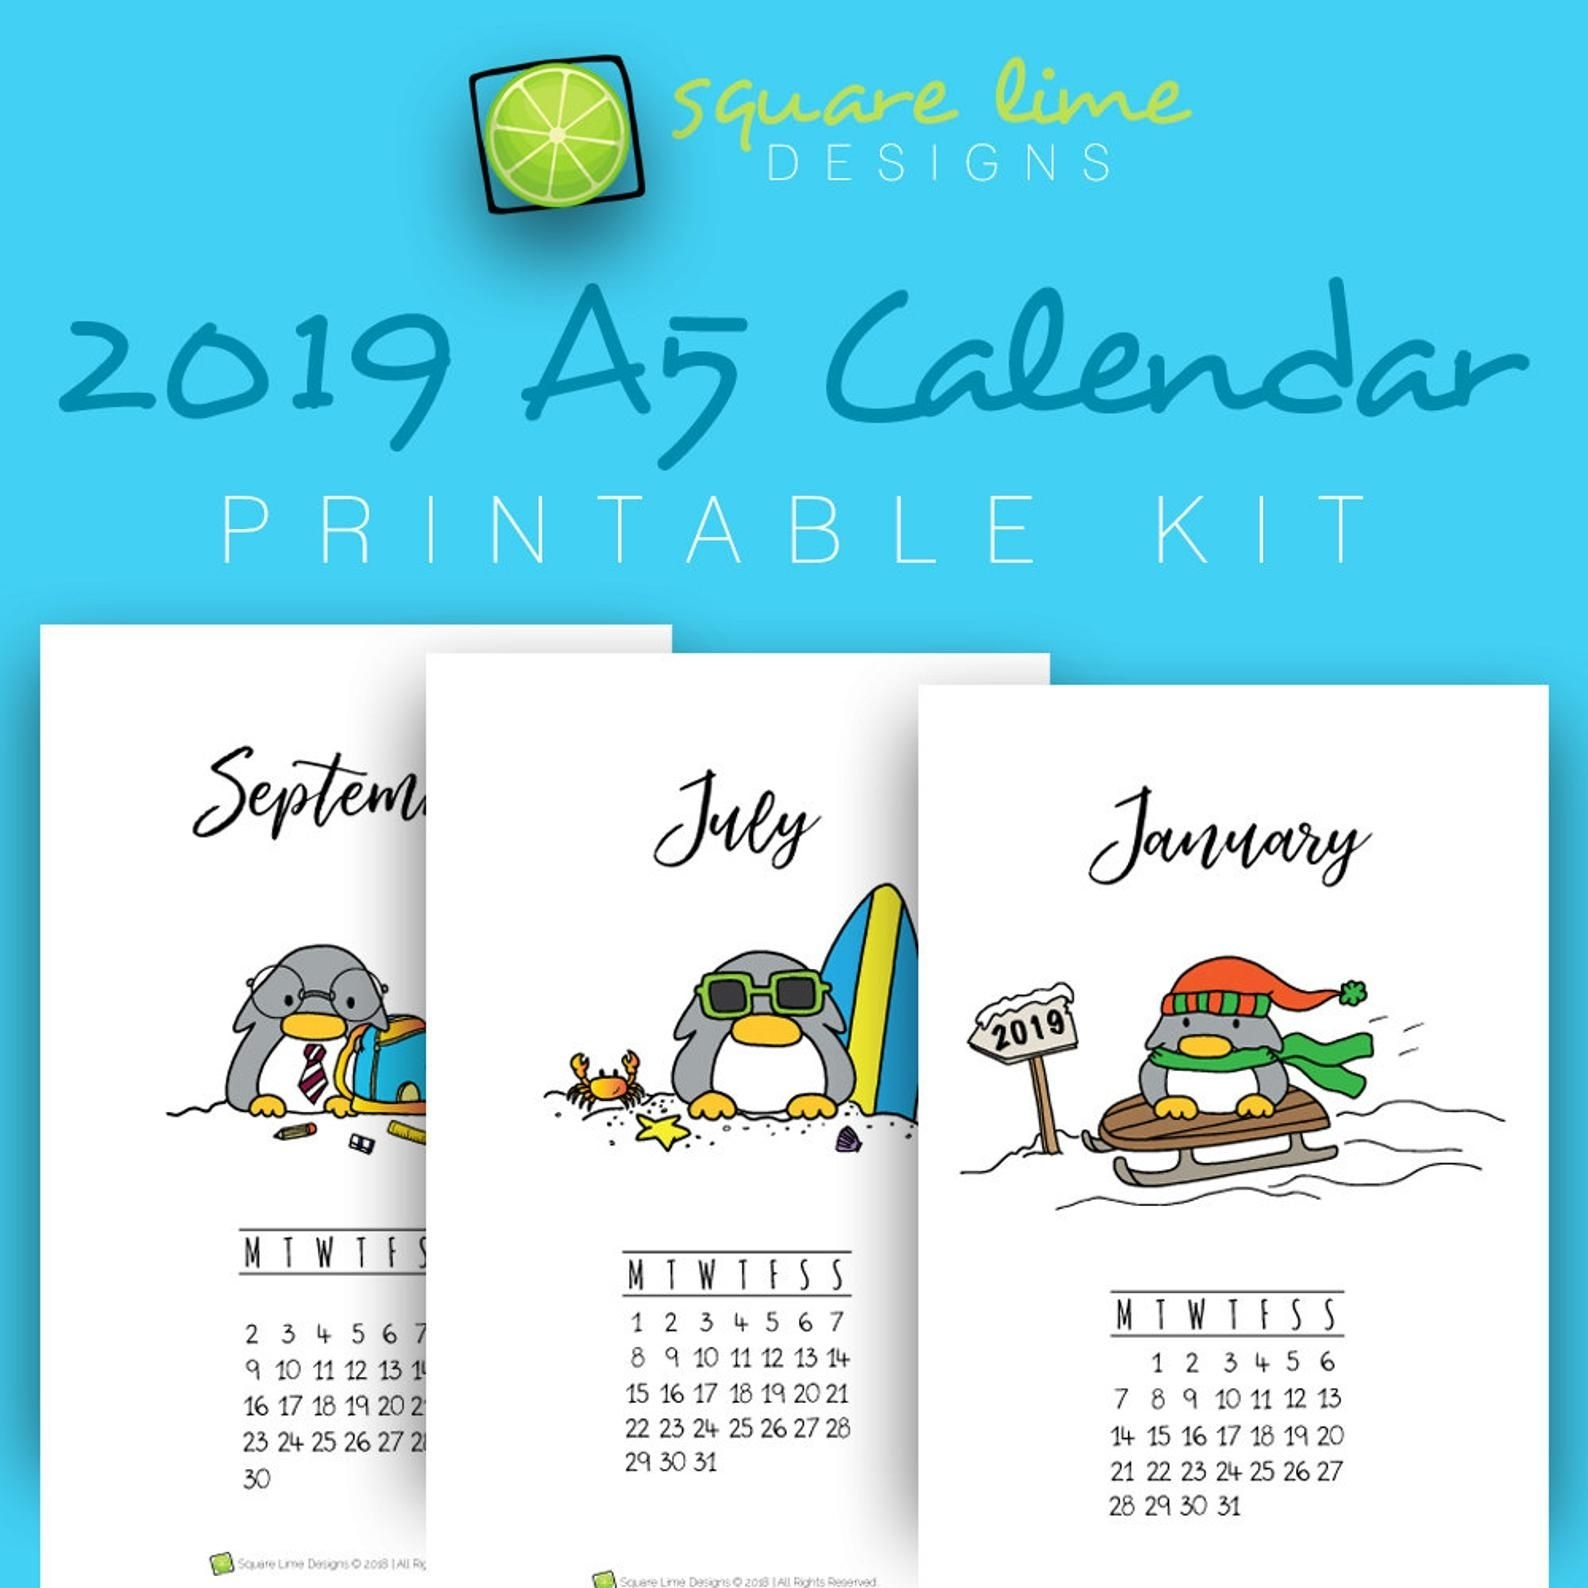 Printable Calendar 2019 / Penguin Calendar Printable / Yearly Planner 2019 / A5 Printable / Wall